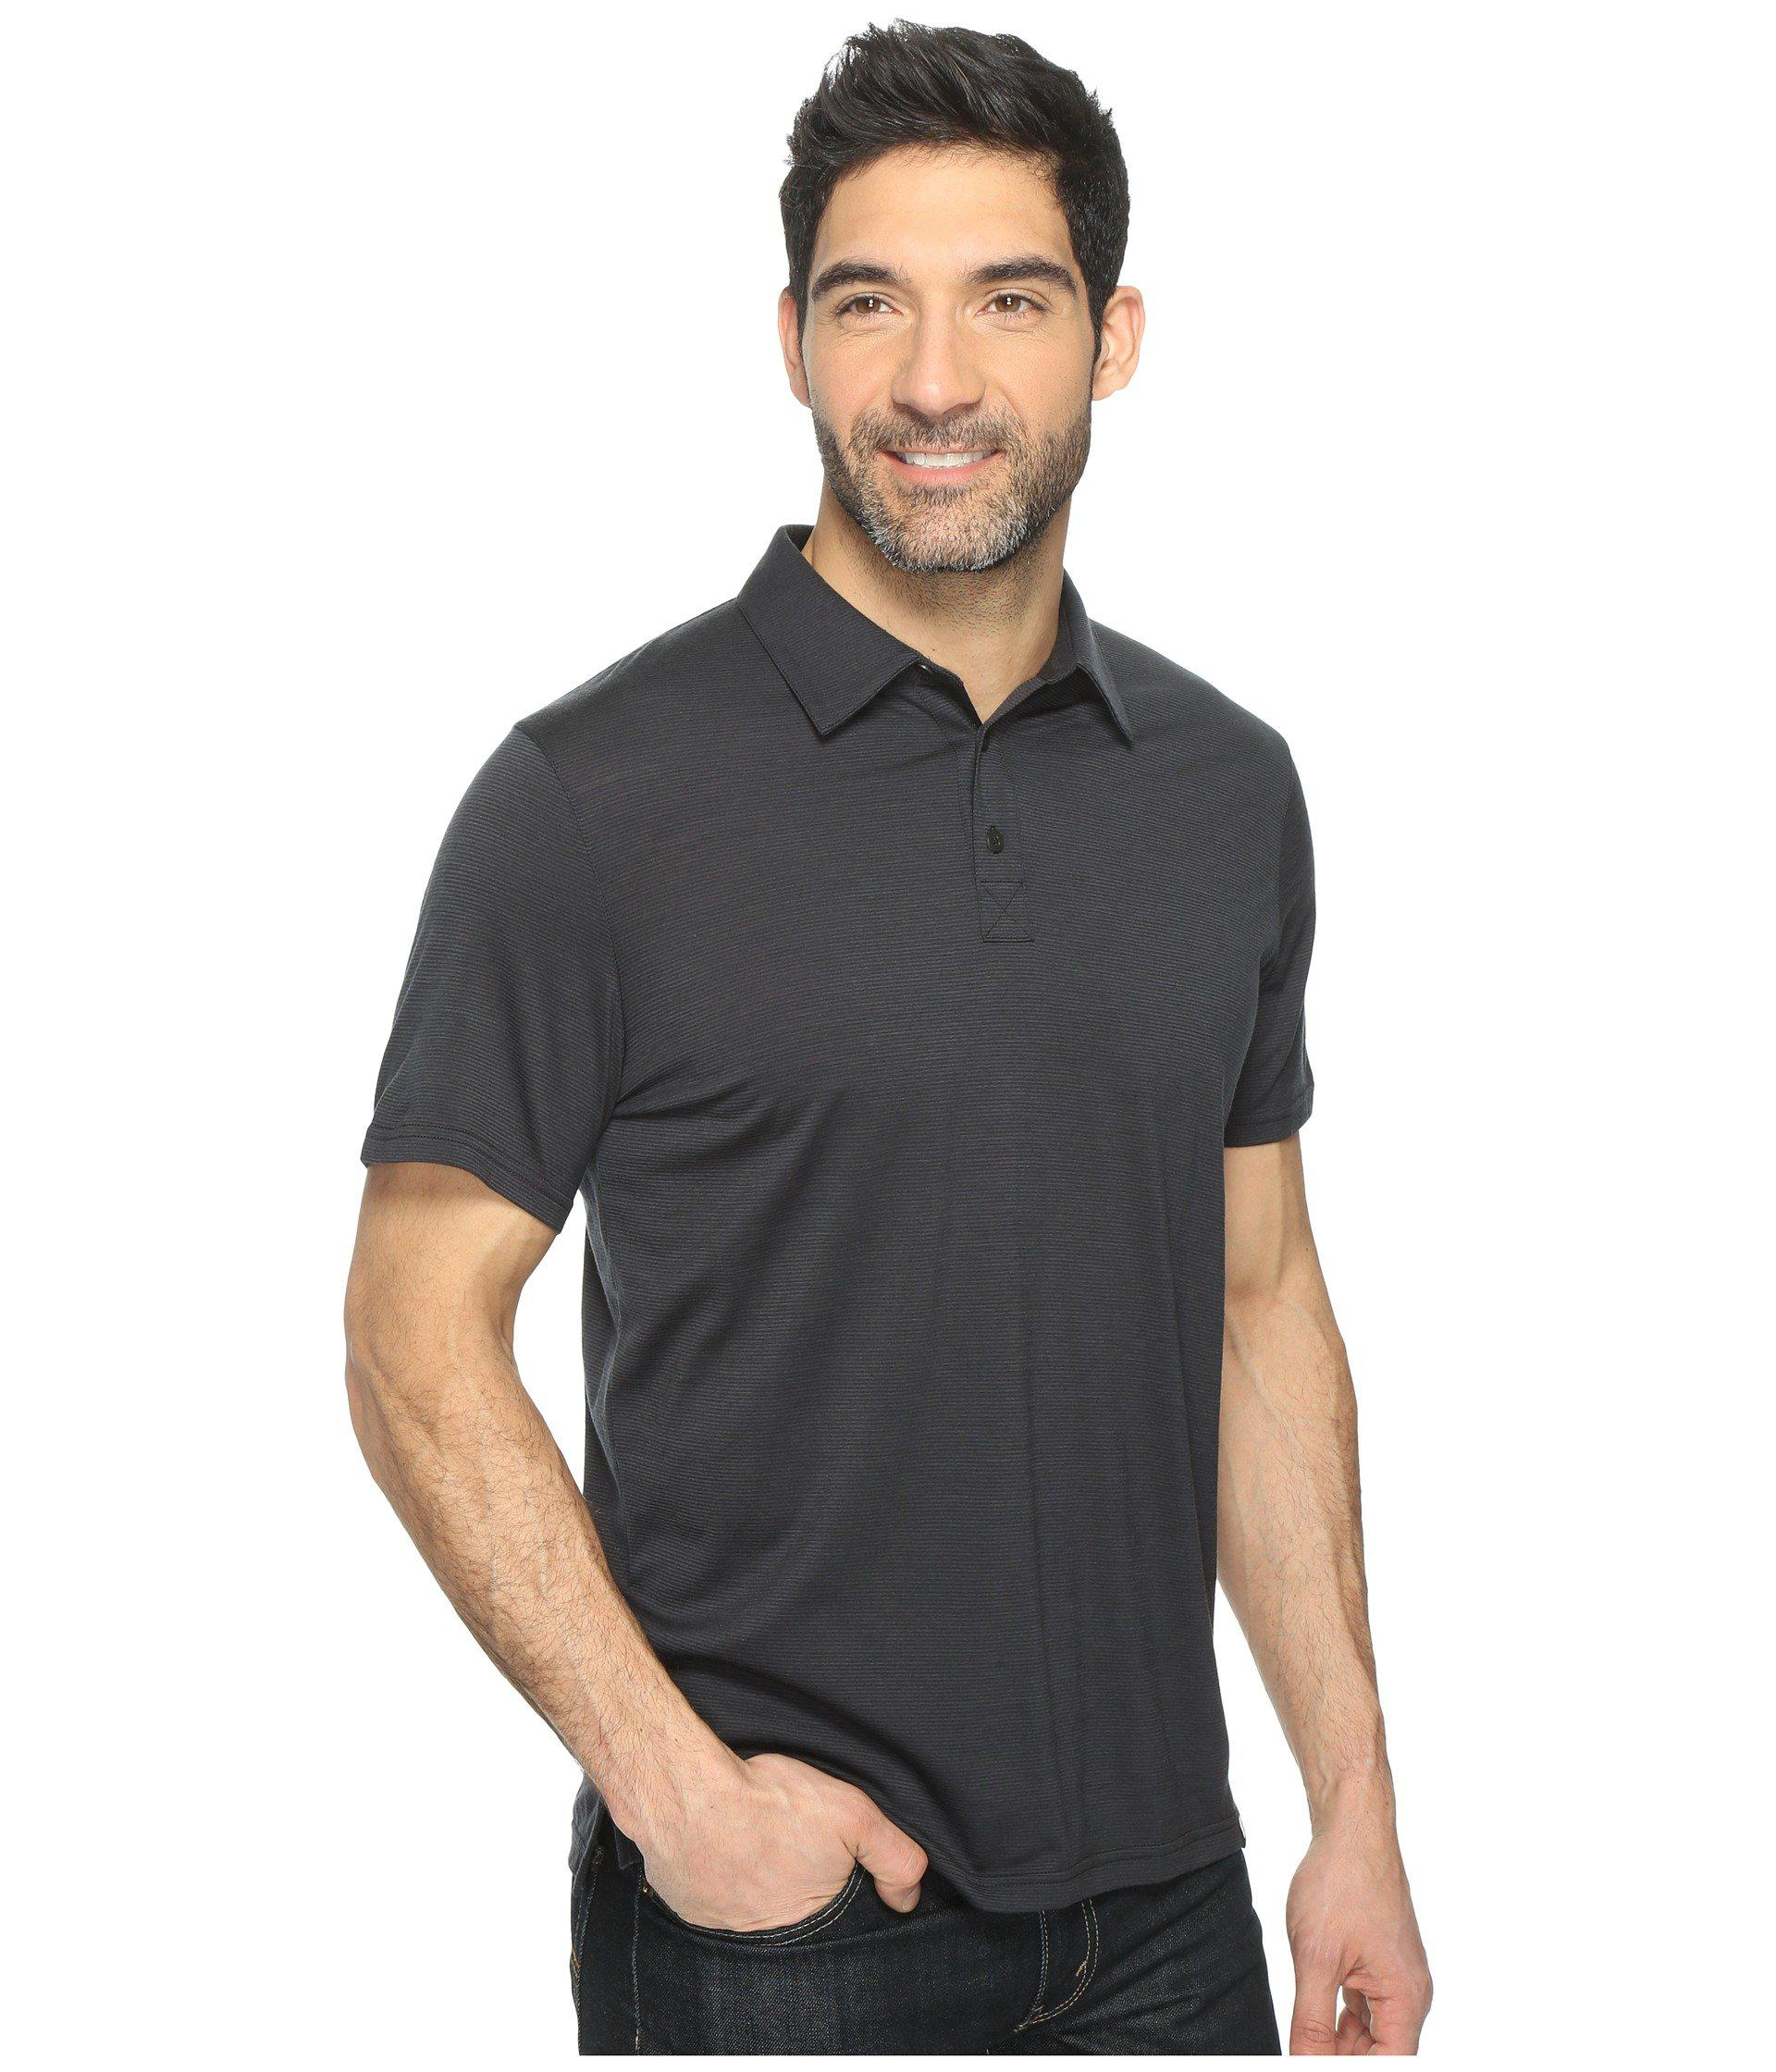 6143848b Smartwool - Gray Merino 150 Pattern Polo (charcoal) Men's Clothing for Men  - Lyst. View fullscreen